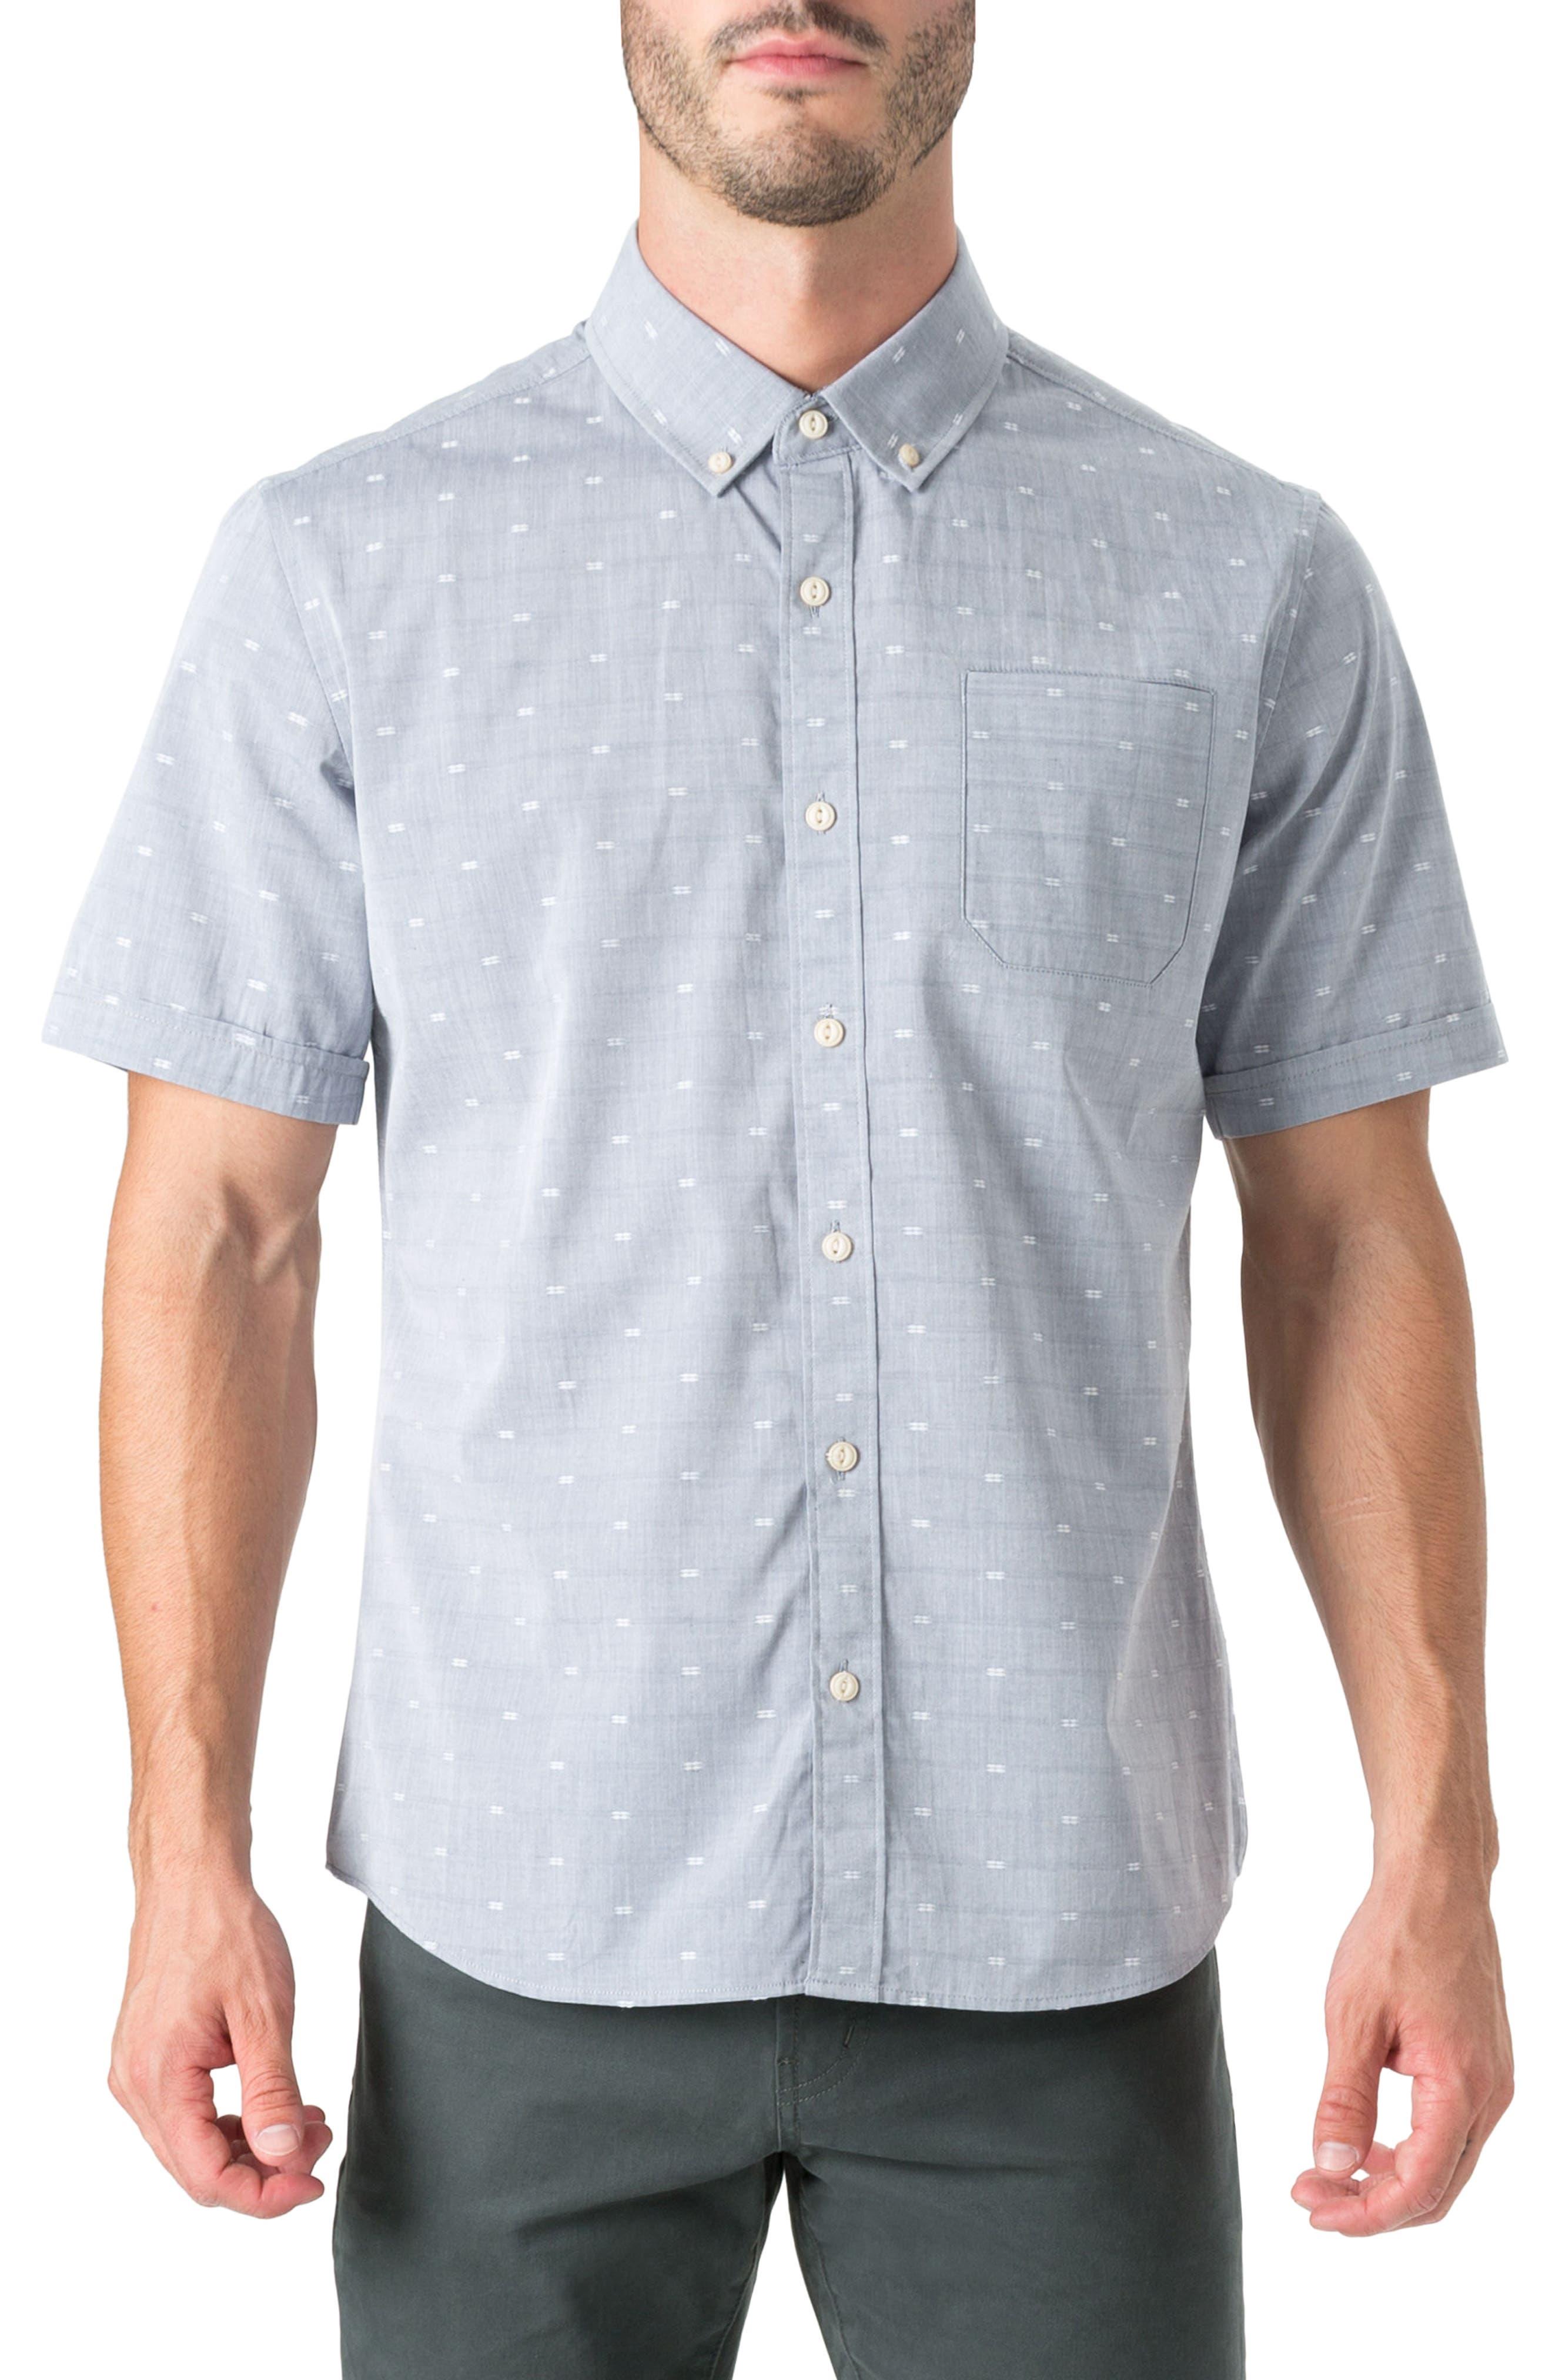 7 Diamonds Revolution Rock Woven Shirt